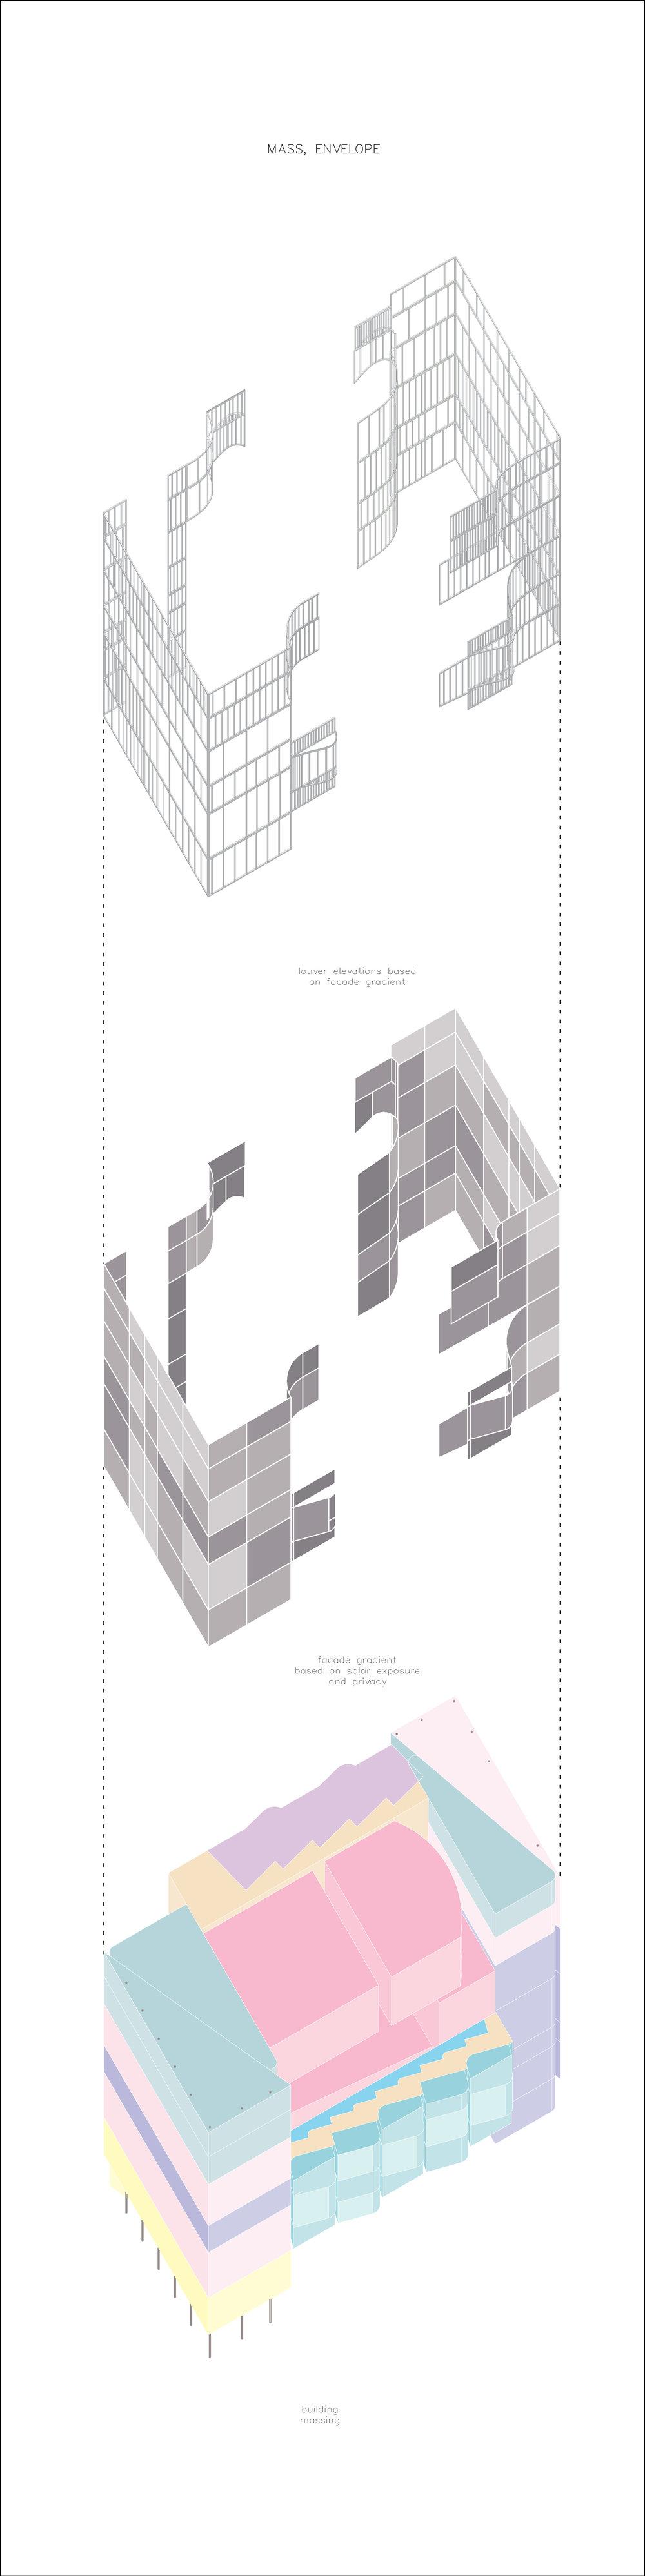 diagrams 1203_Page_3.jpg